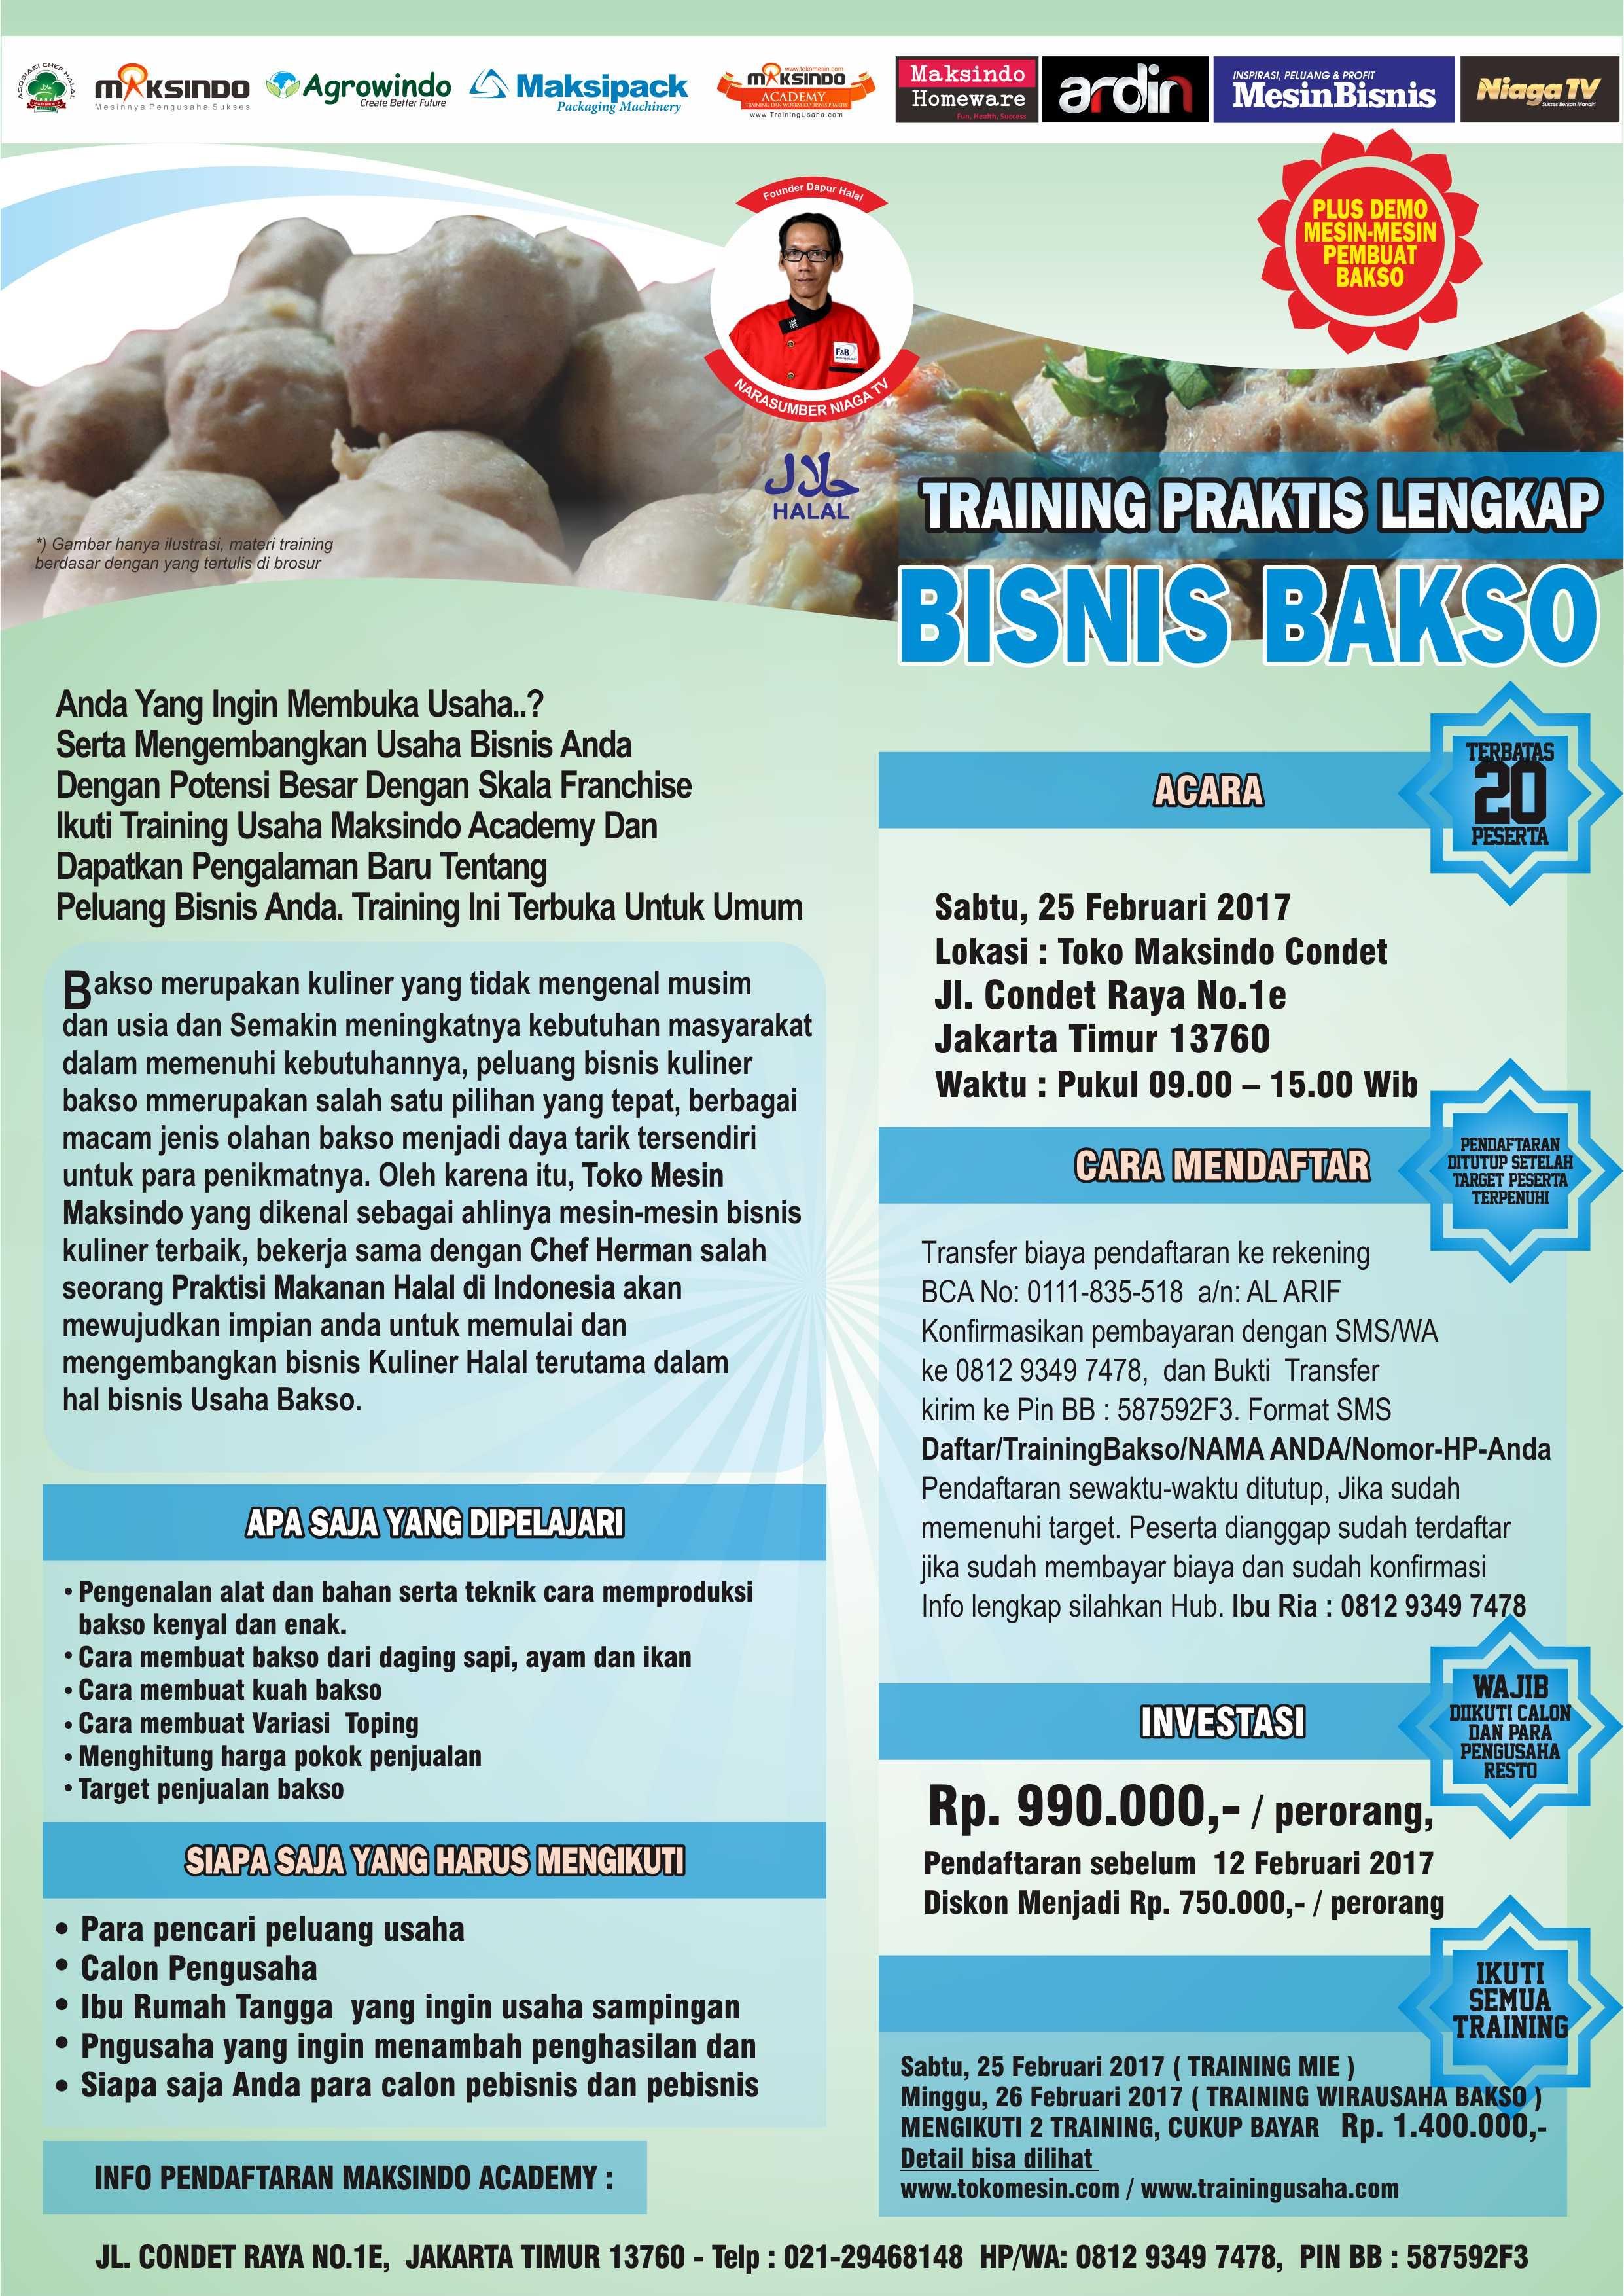 Training Usaha Bakso di Condet, 25 Febuari 2017